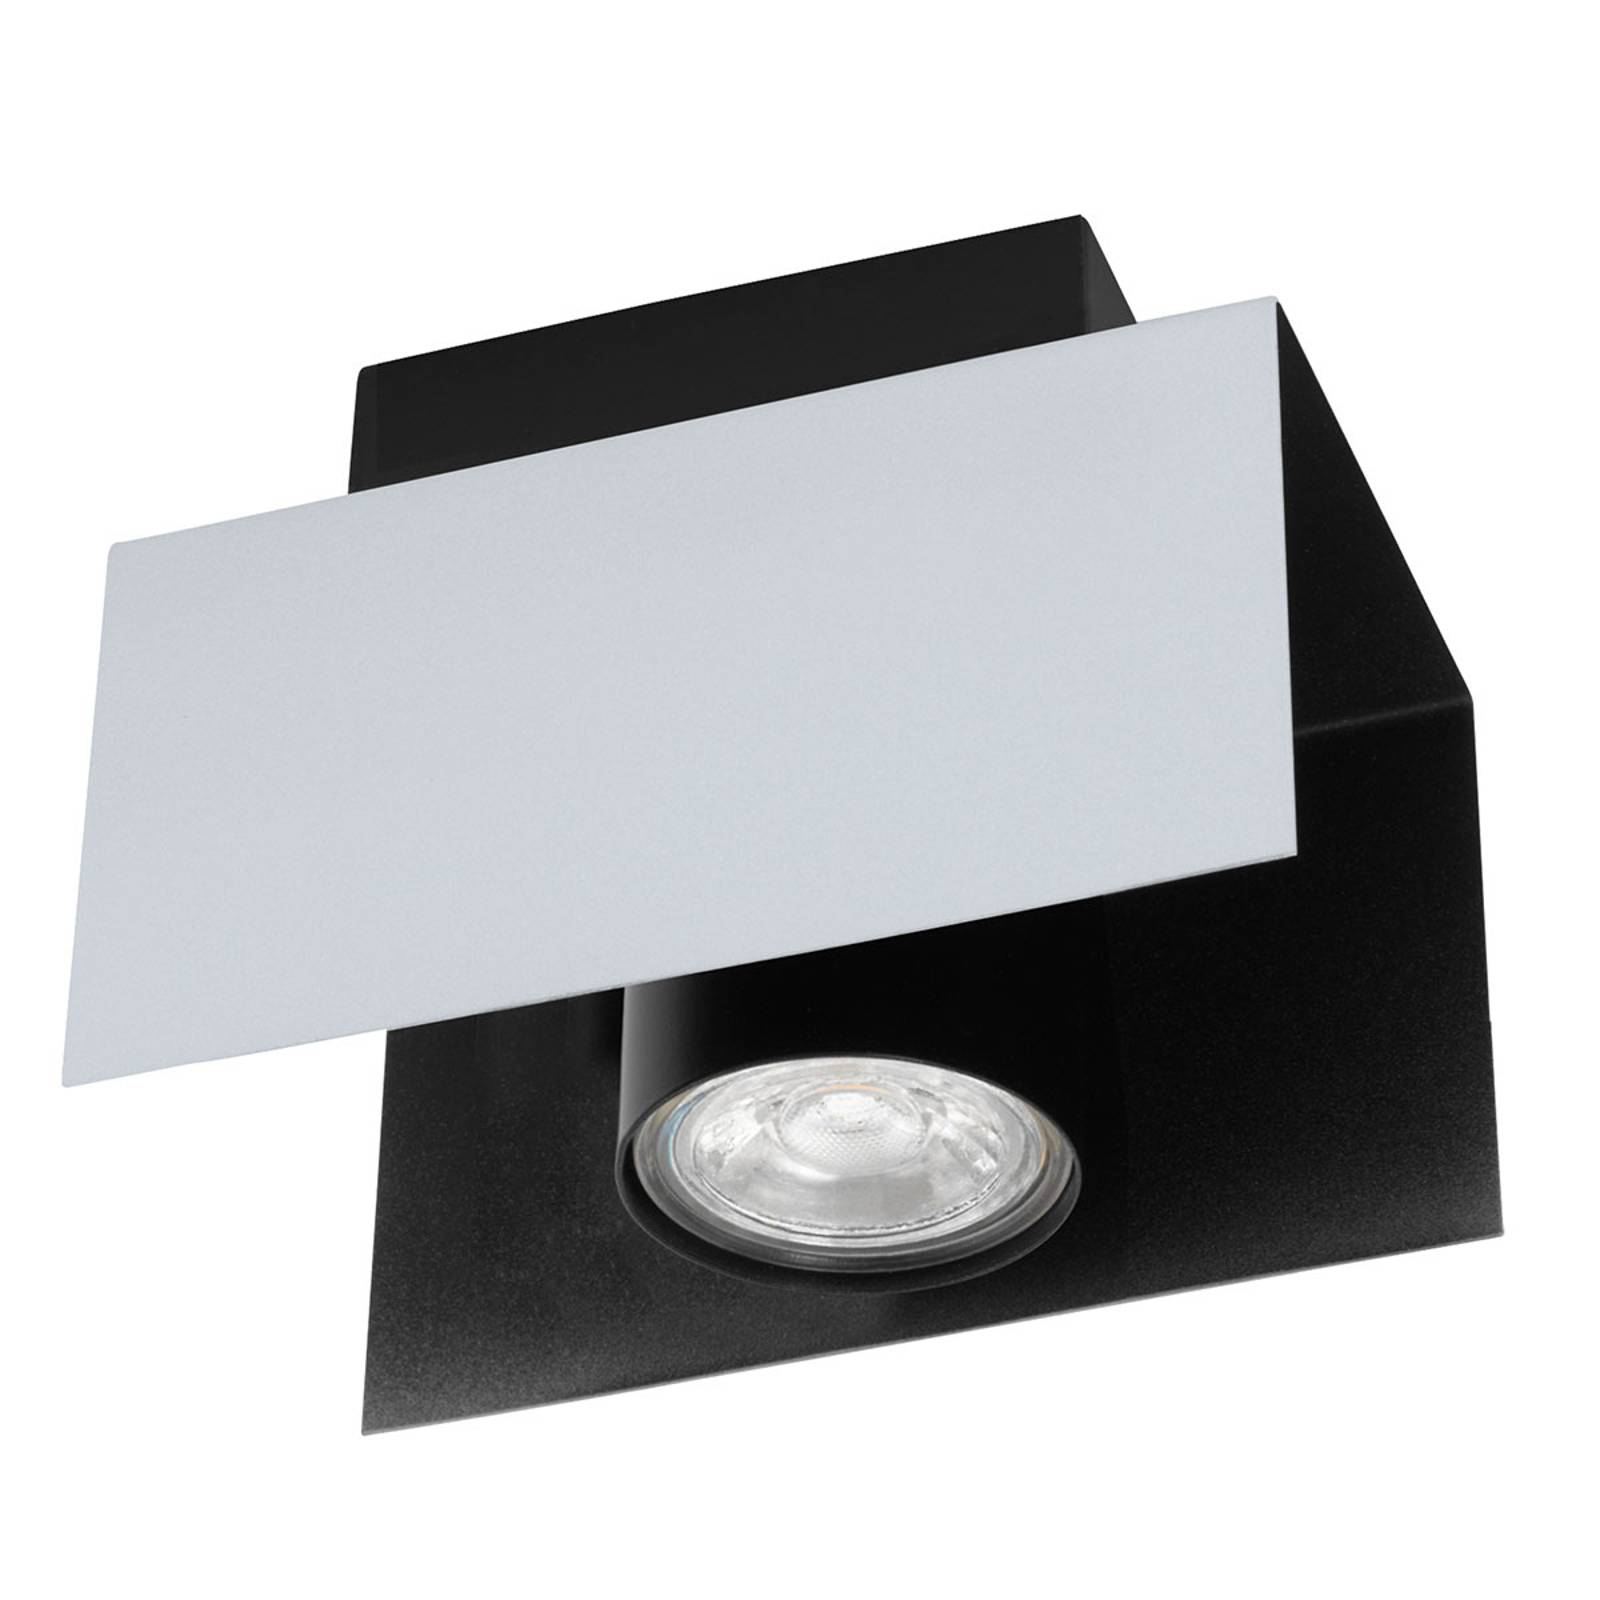 Lampa sufitowa LED Viserba 12cm